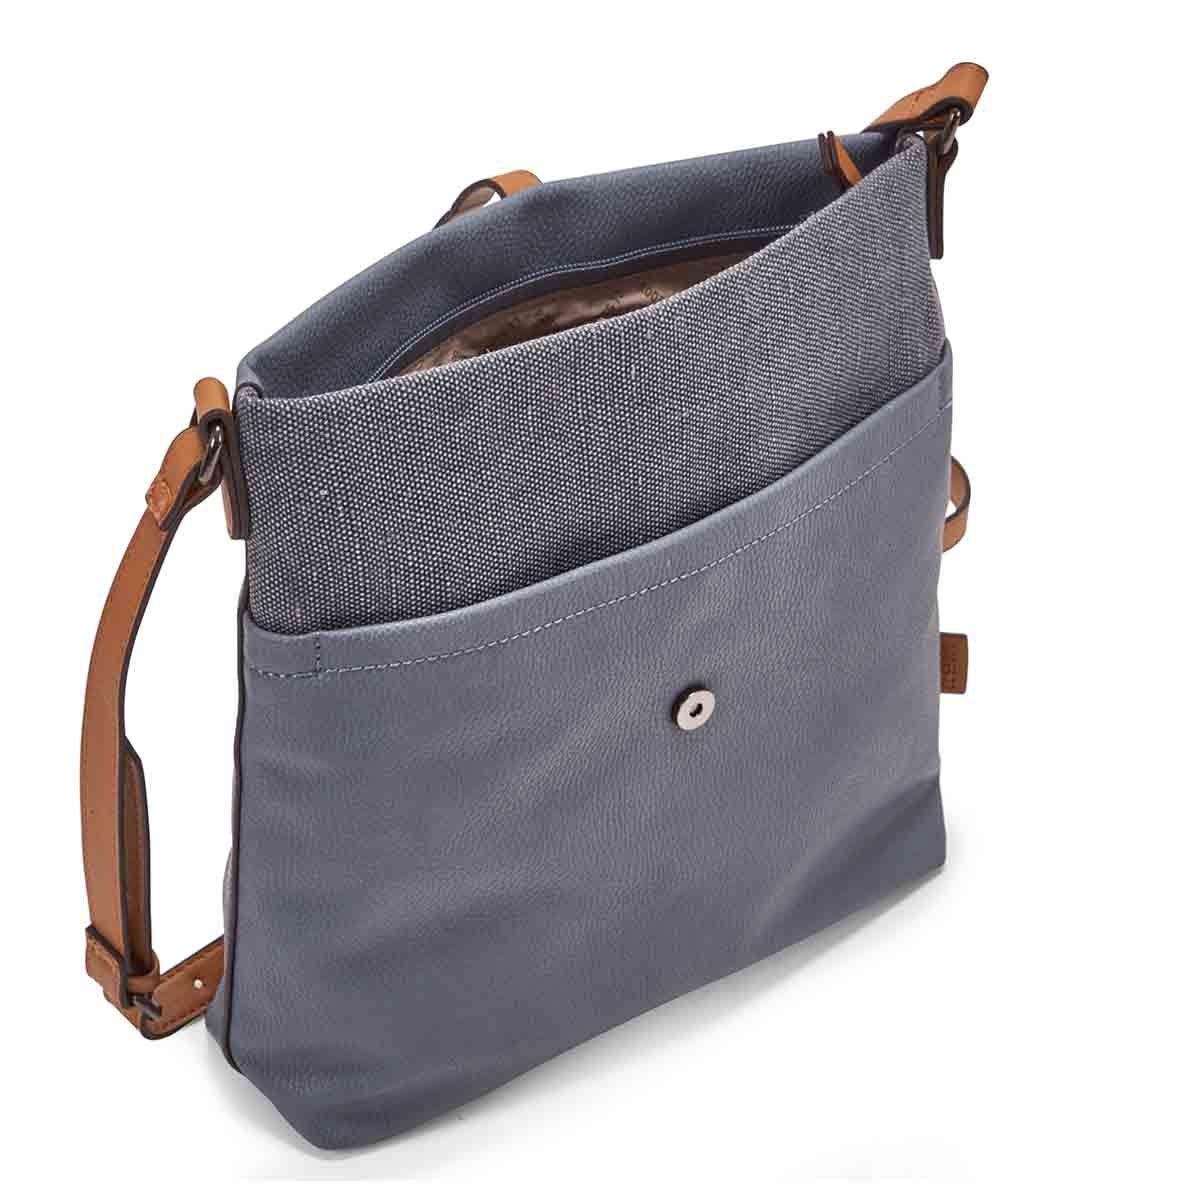 Lds light blue north/south crossbody bag